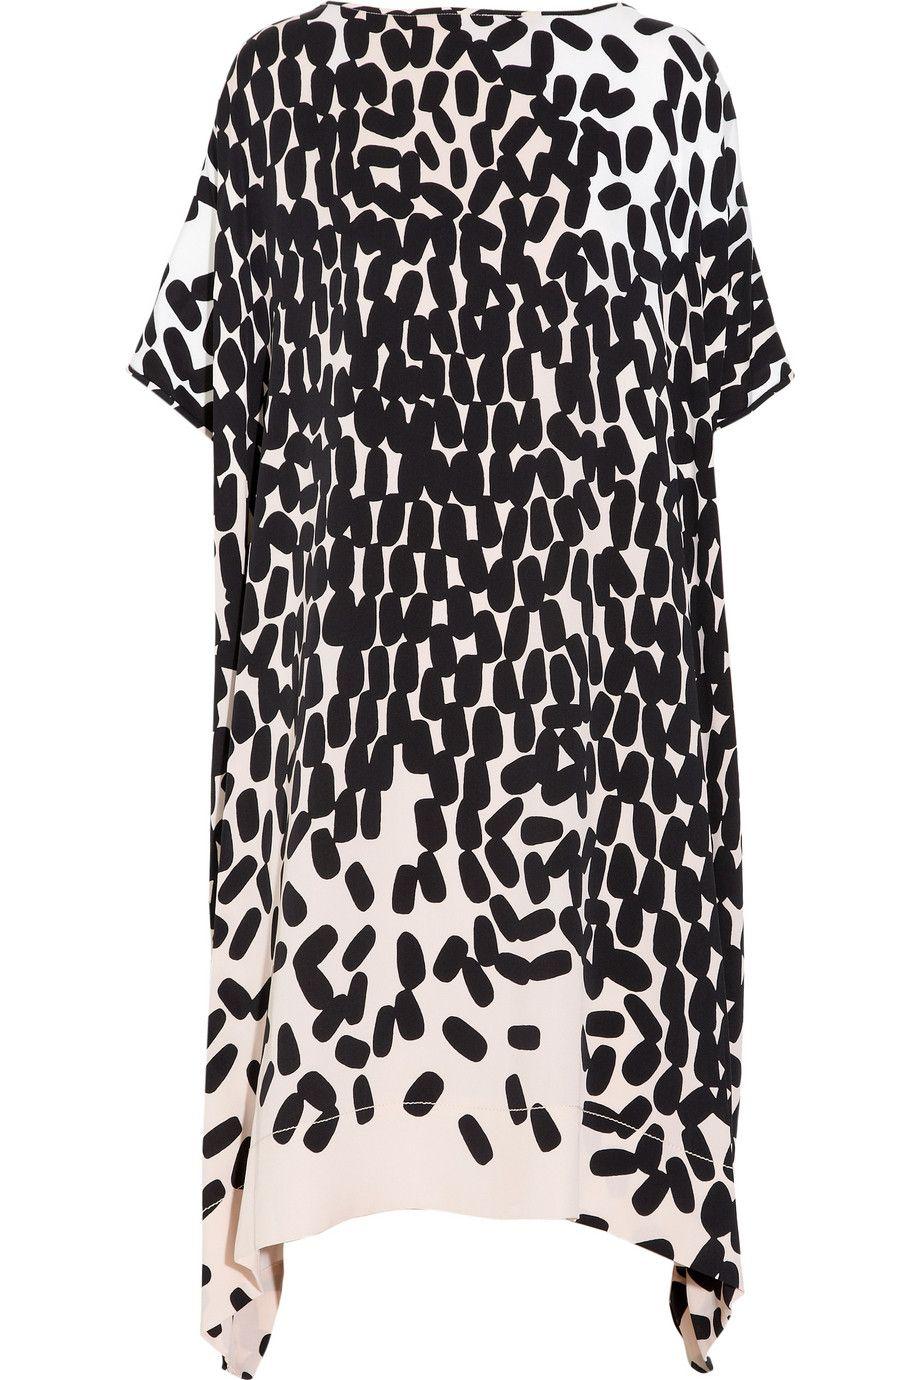 Scattered pebble print dress; monochrome pattern fashion // Diane von Furstenberg